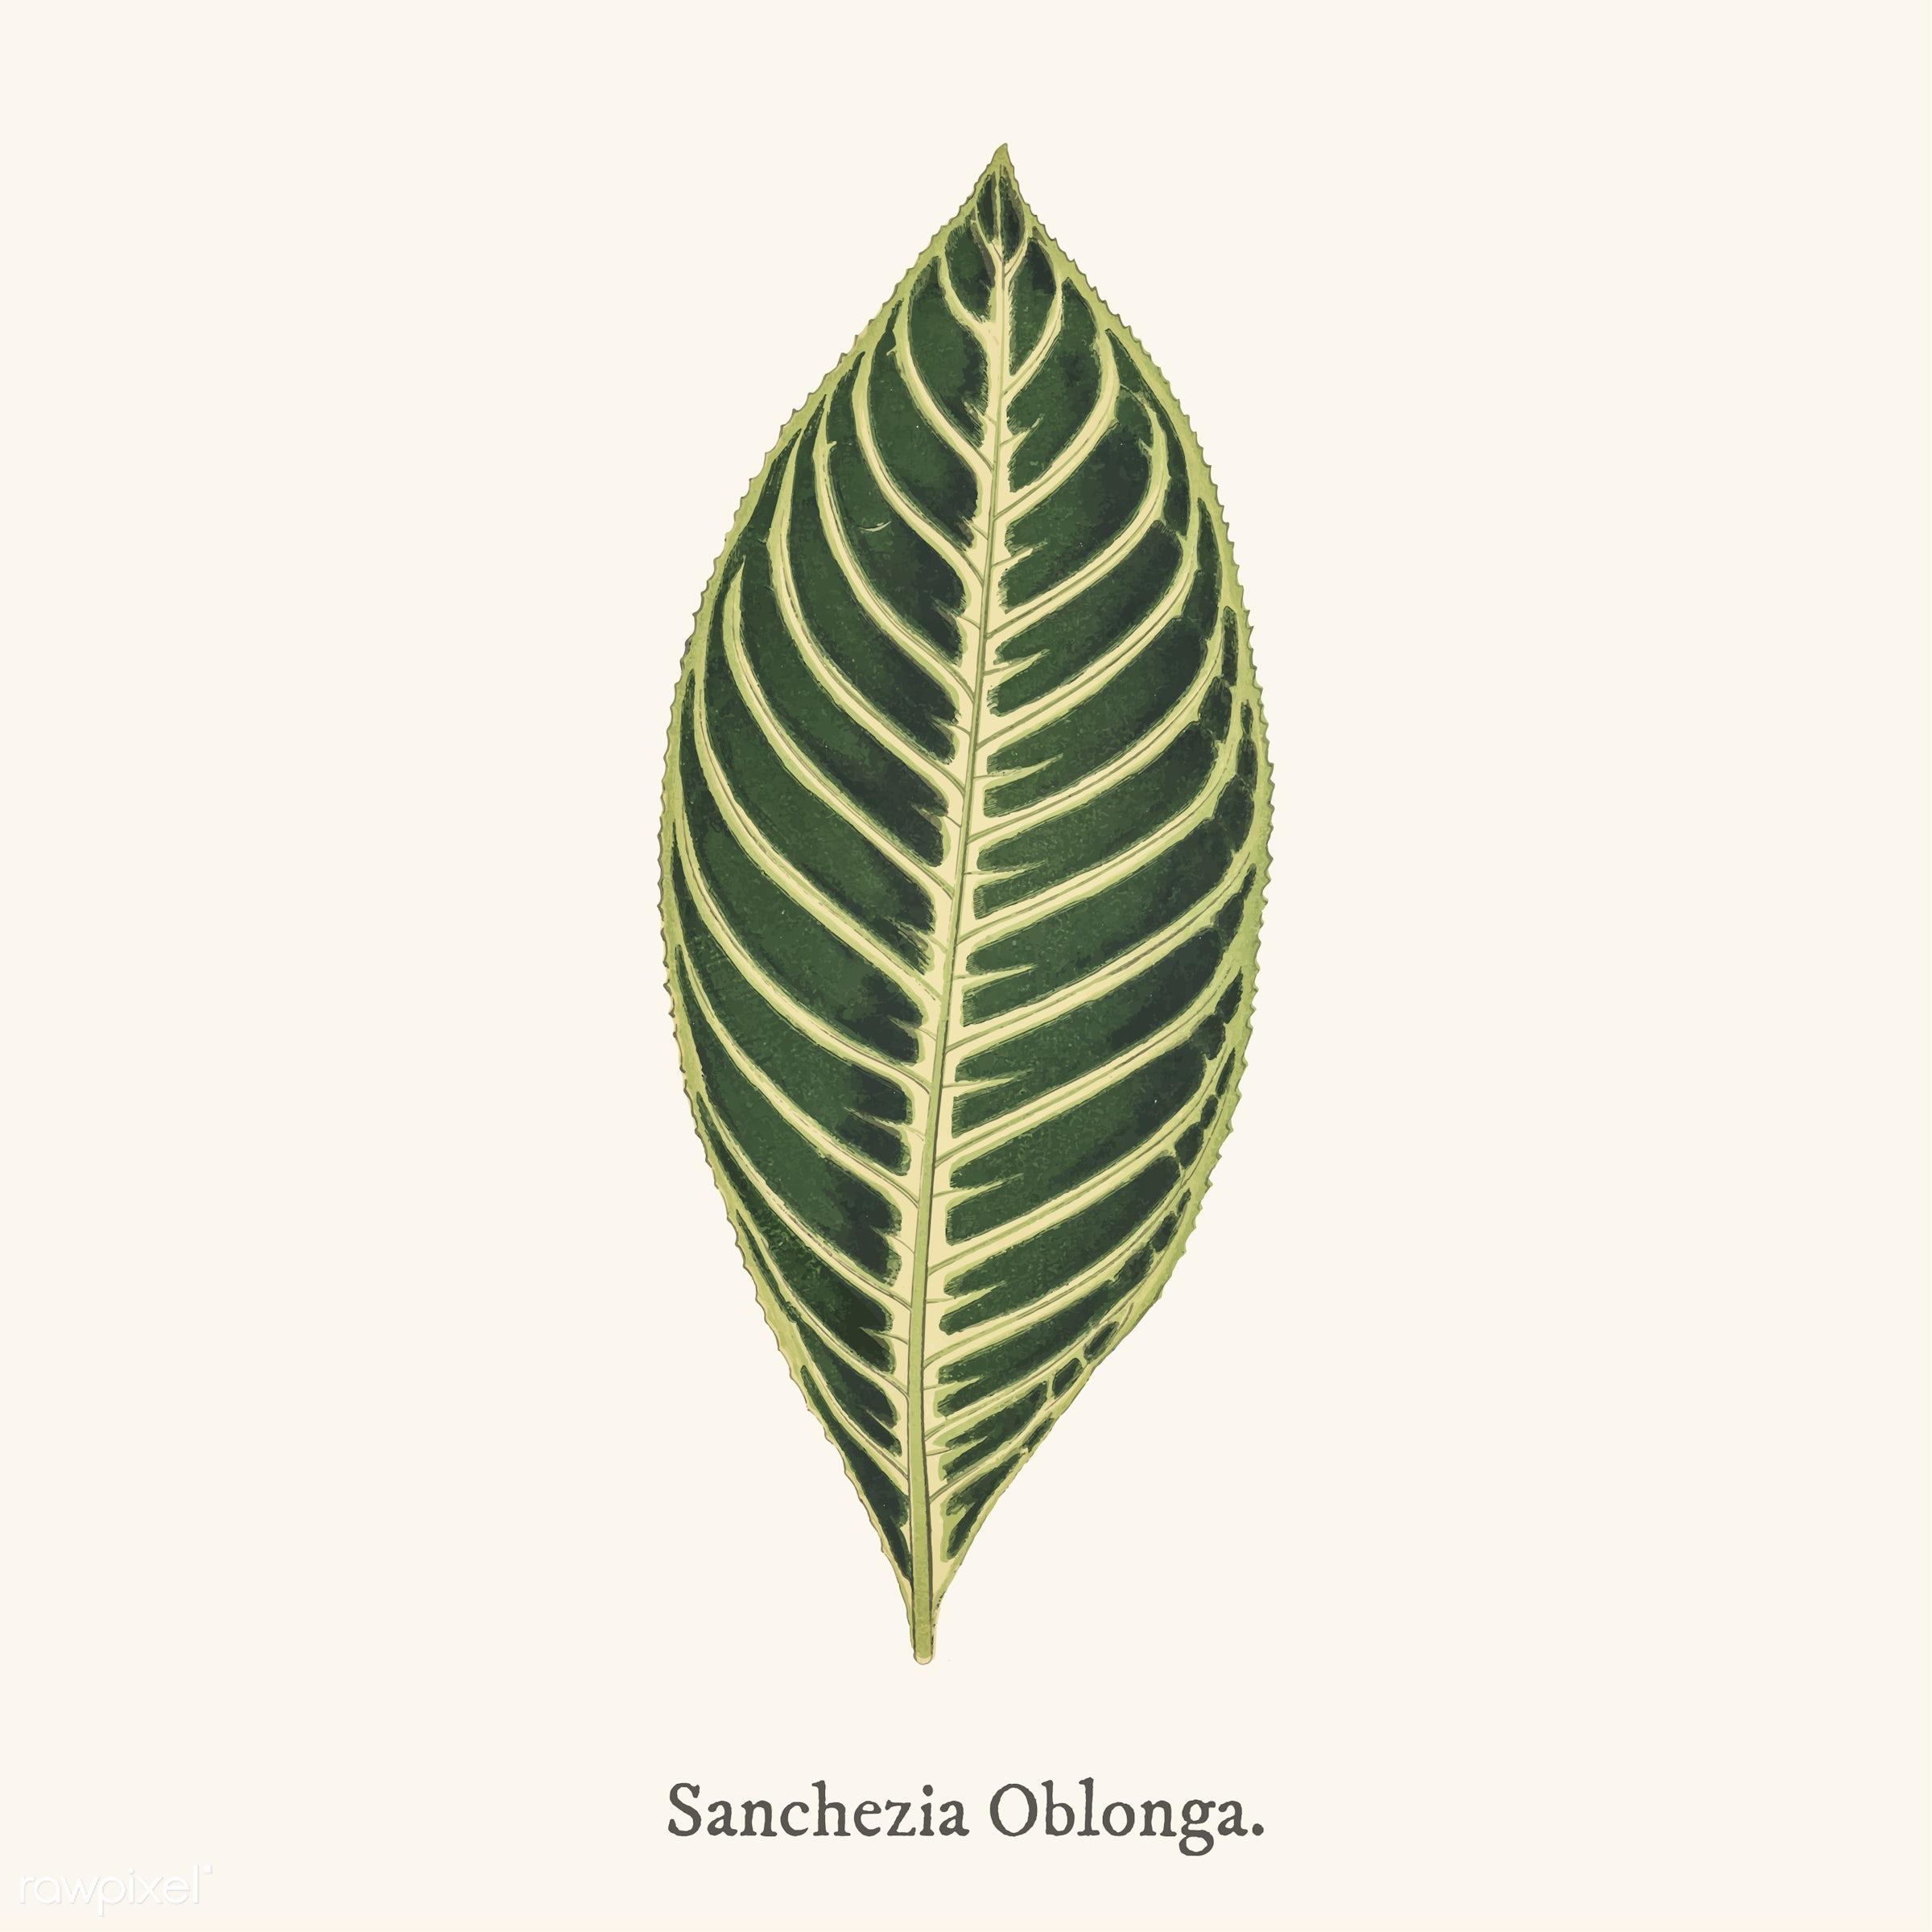 ancient, antique, decorate, decoration, design, drawing, graphic, illustration, leaf, leaves, nature, nobilis, old, pattern...